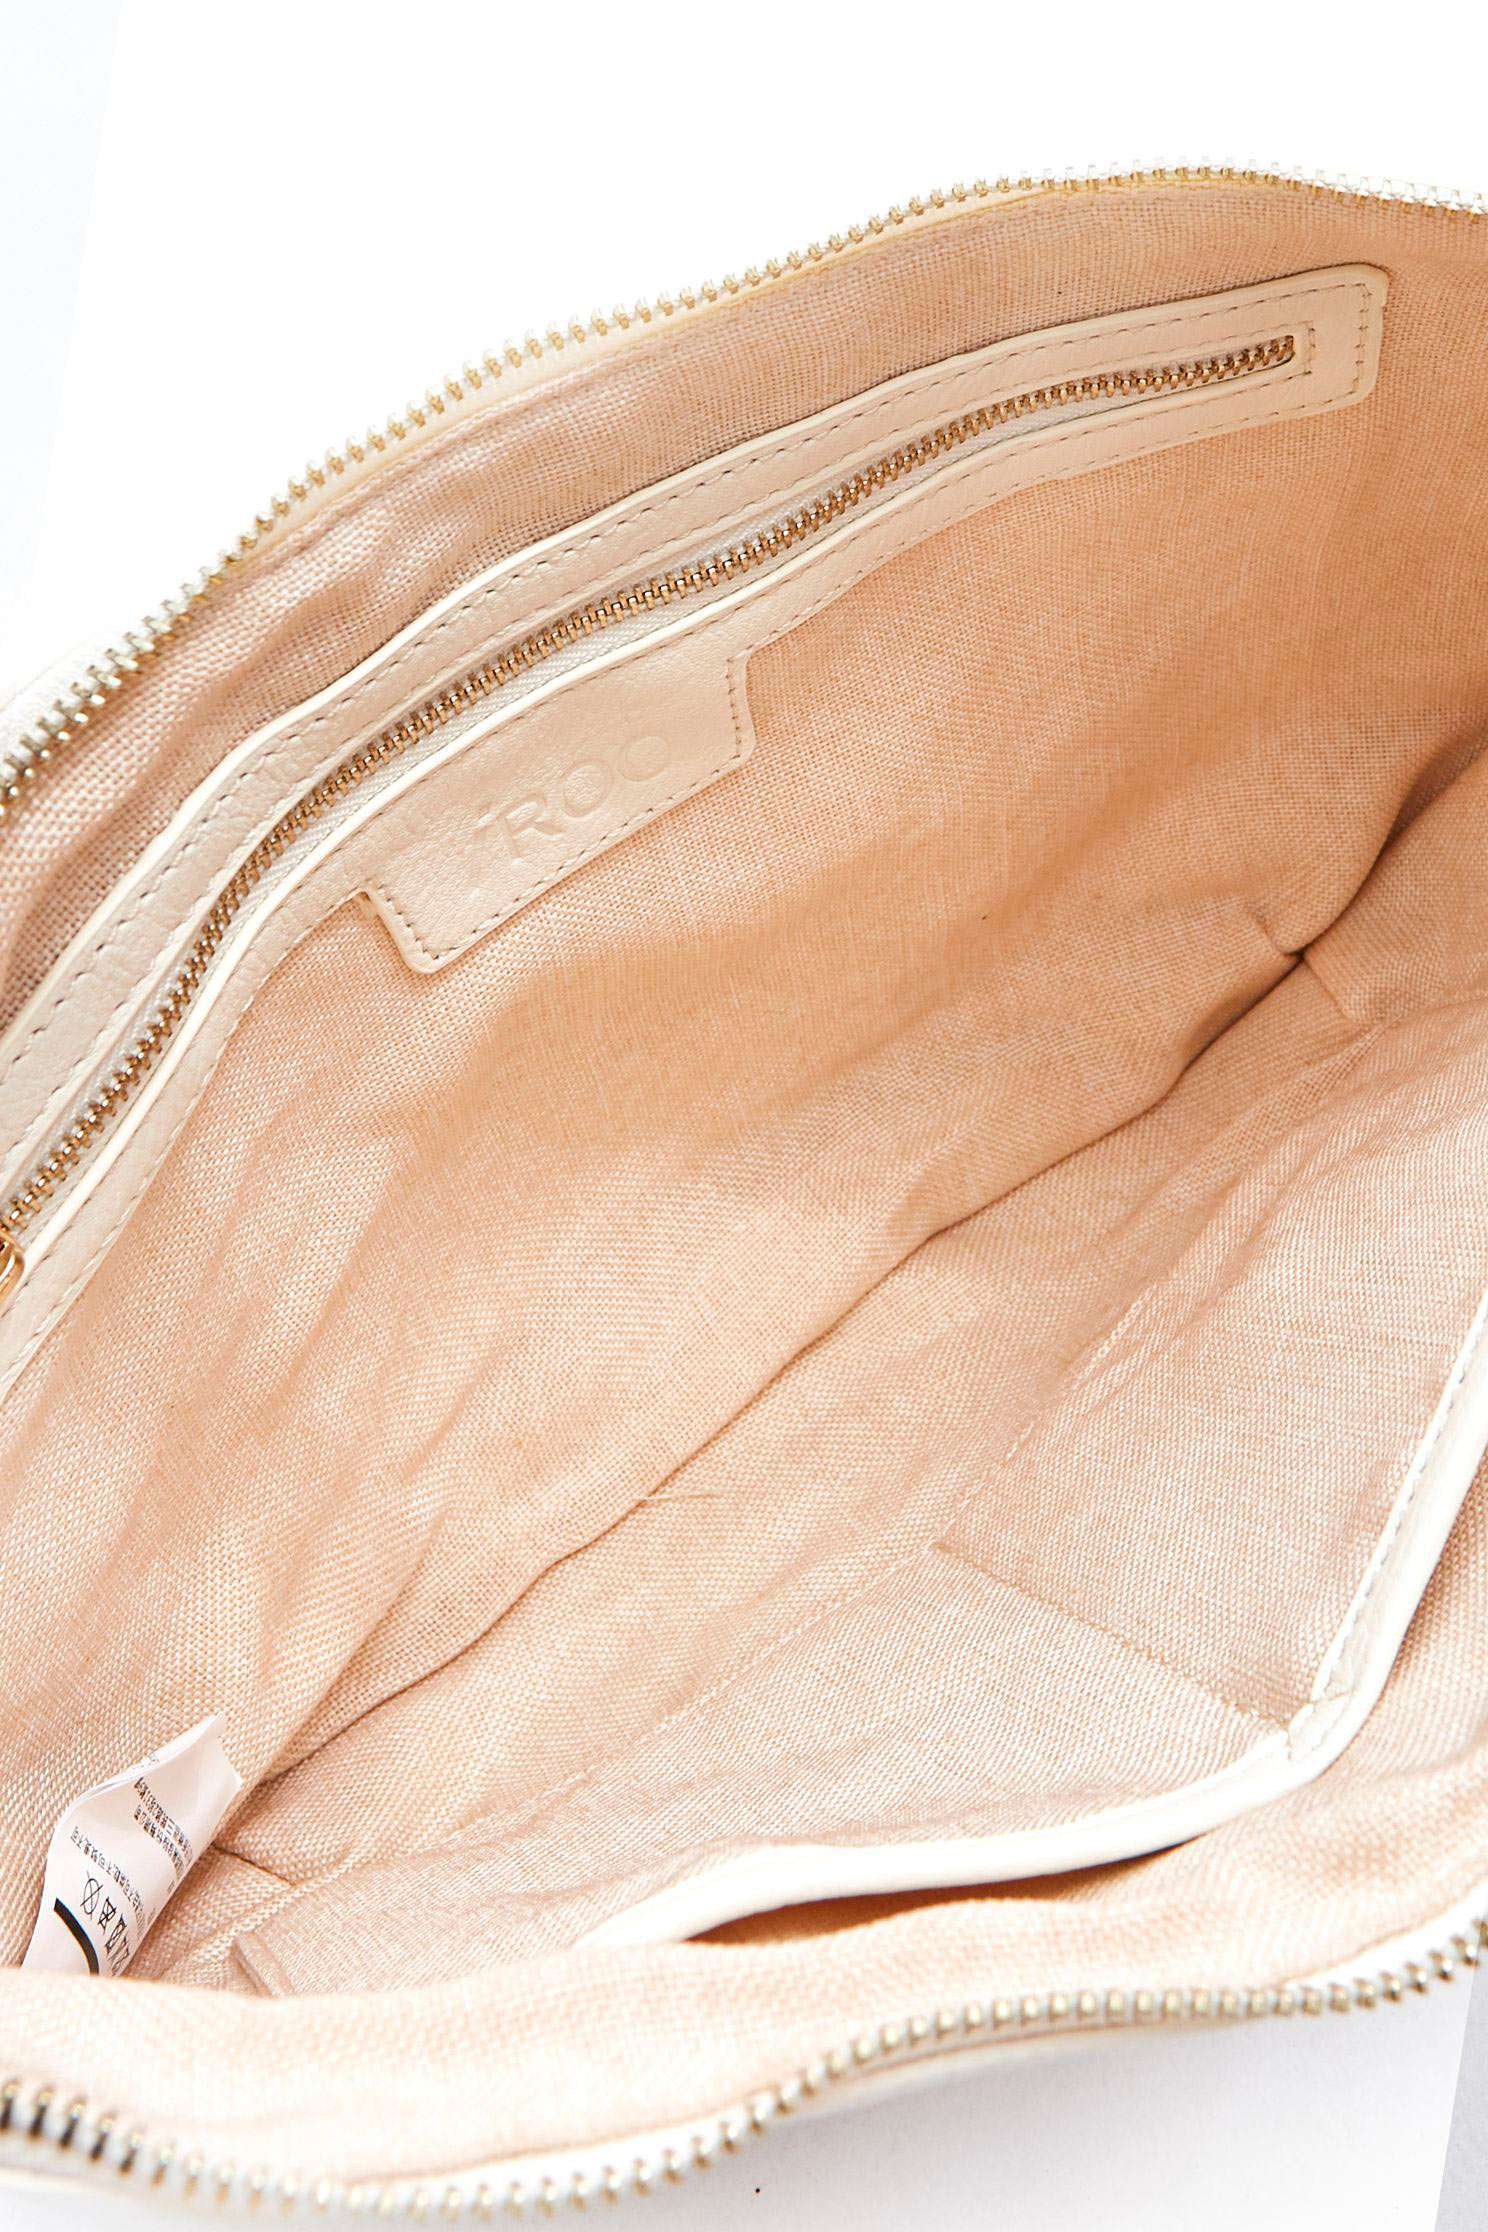 LOVE Small hobo bag,Slingbag,Shoulder bag